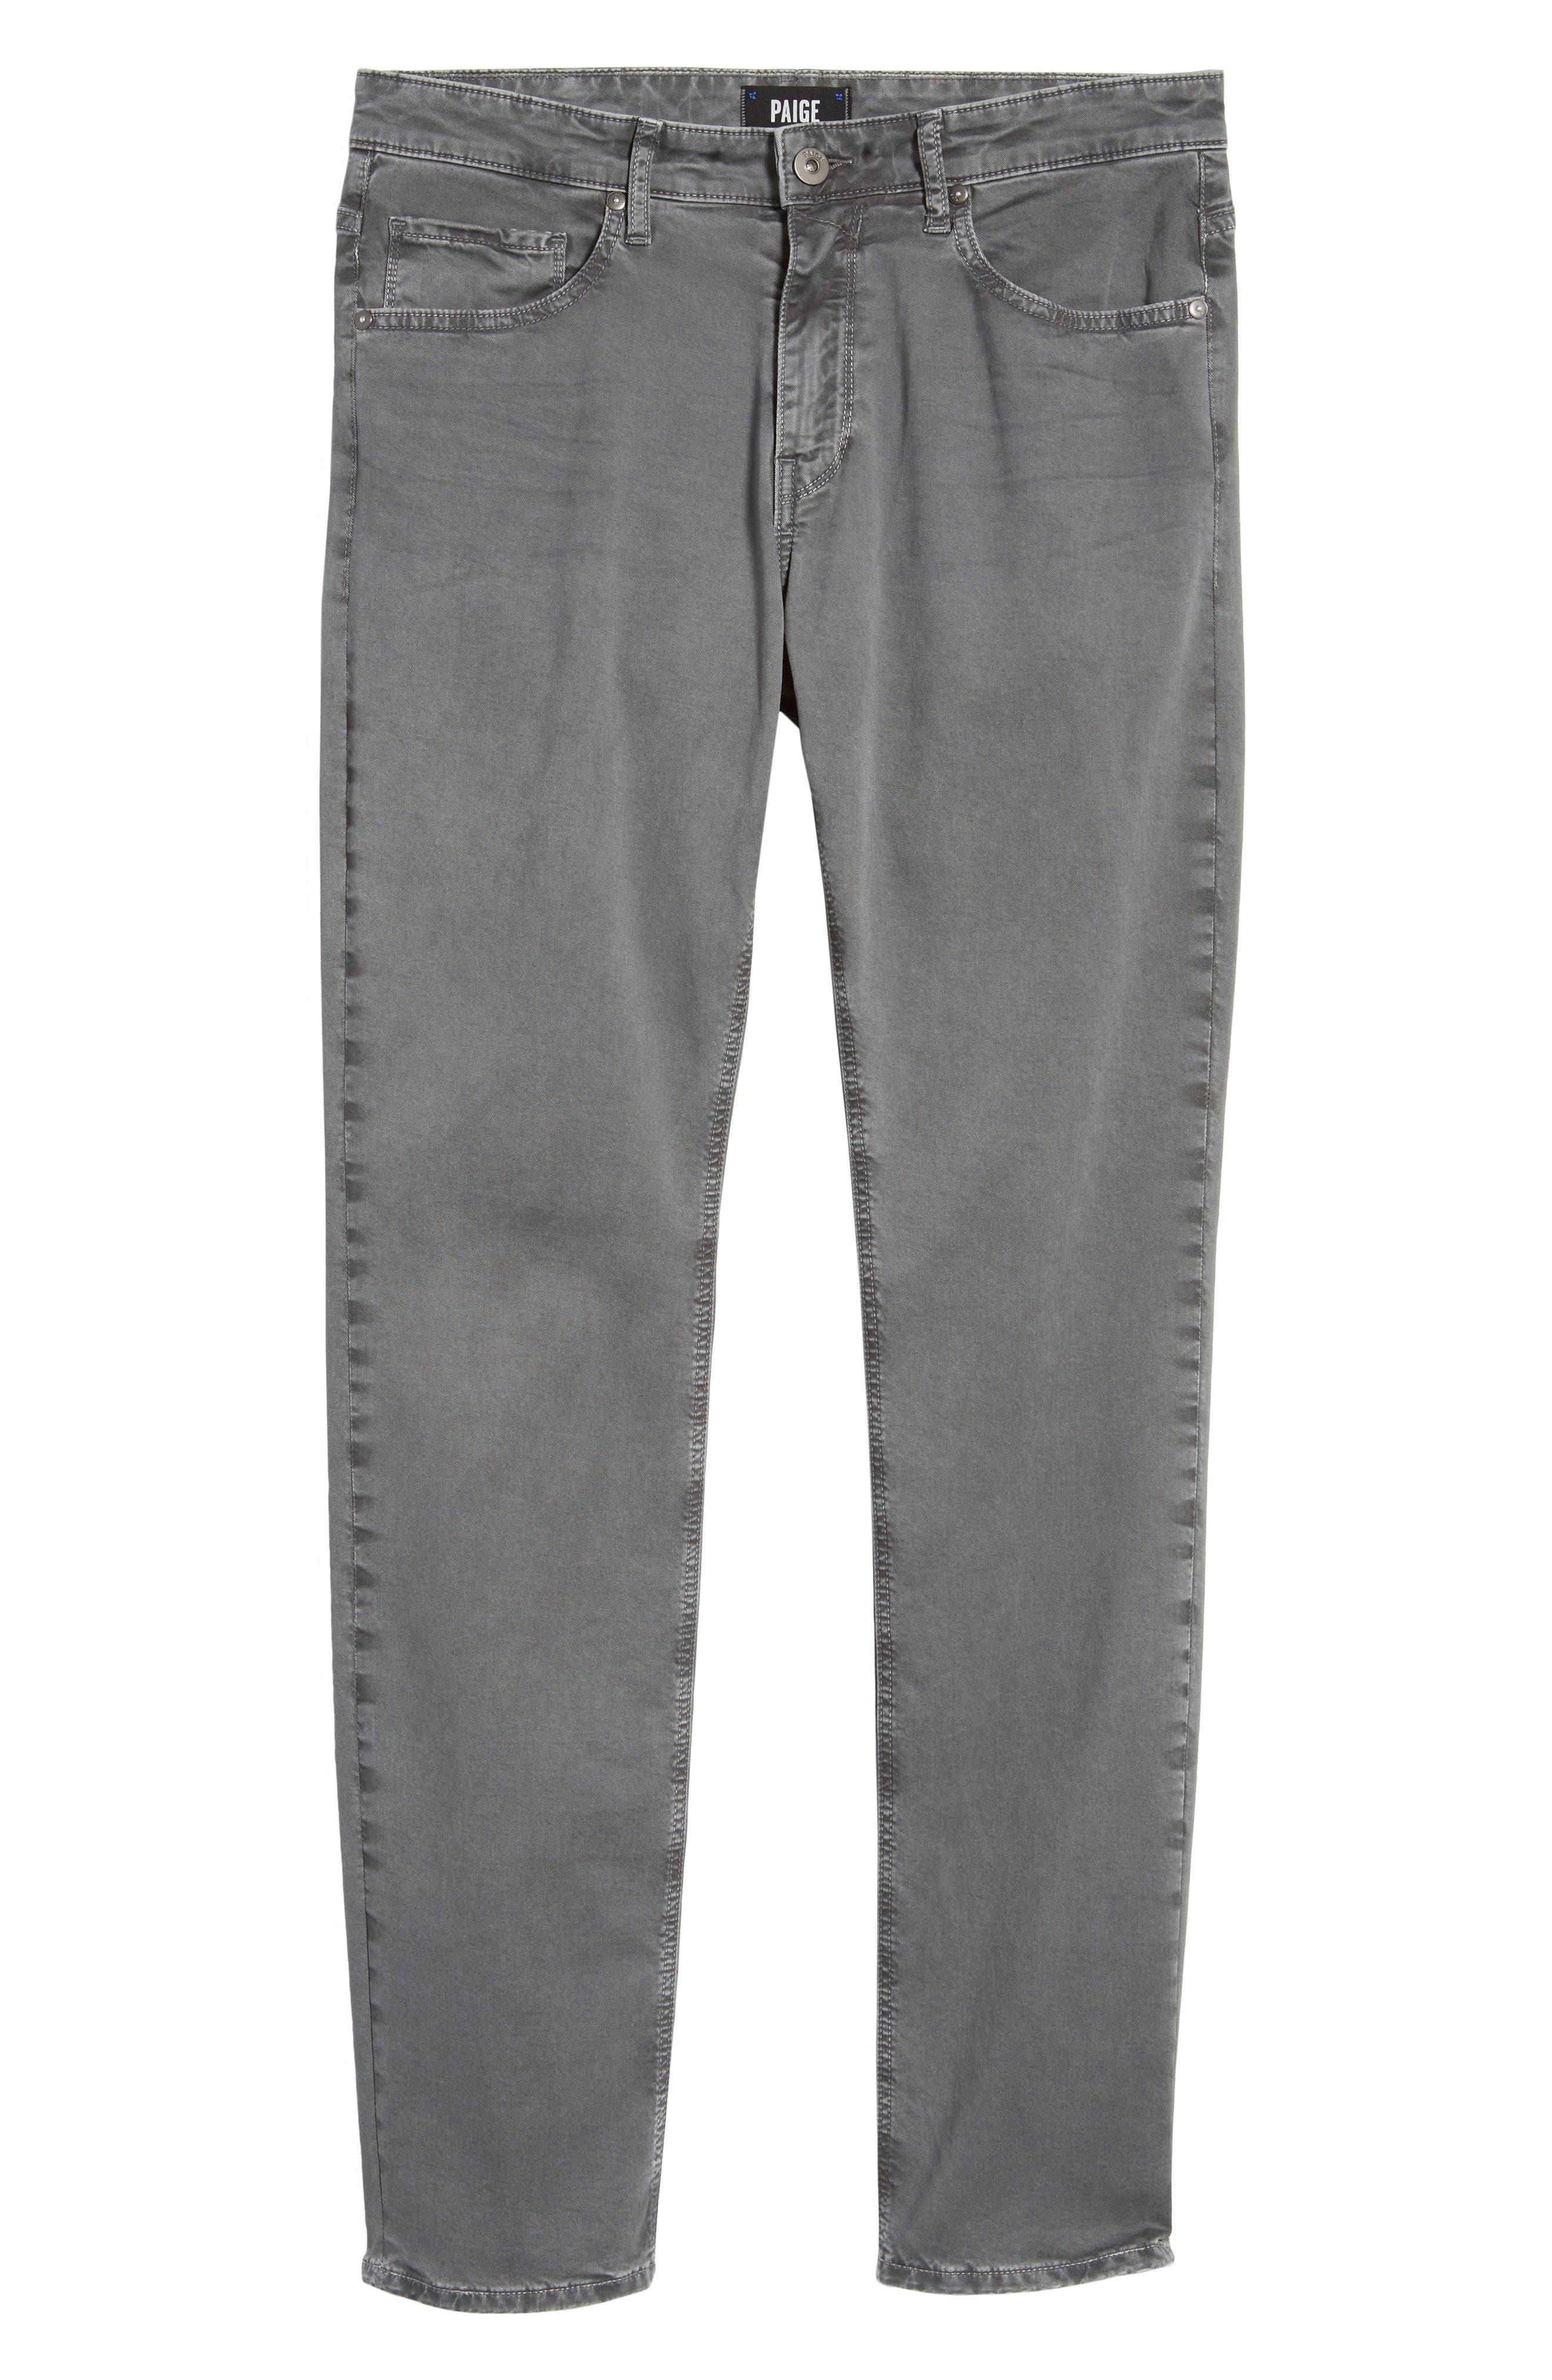 Lennox Slim Fit Five-Pocket Pants,                             Alternate thumbnail 6, color,                             VINTAGE THUNDER GREY